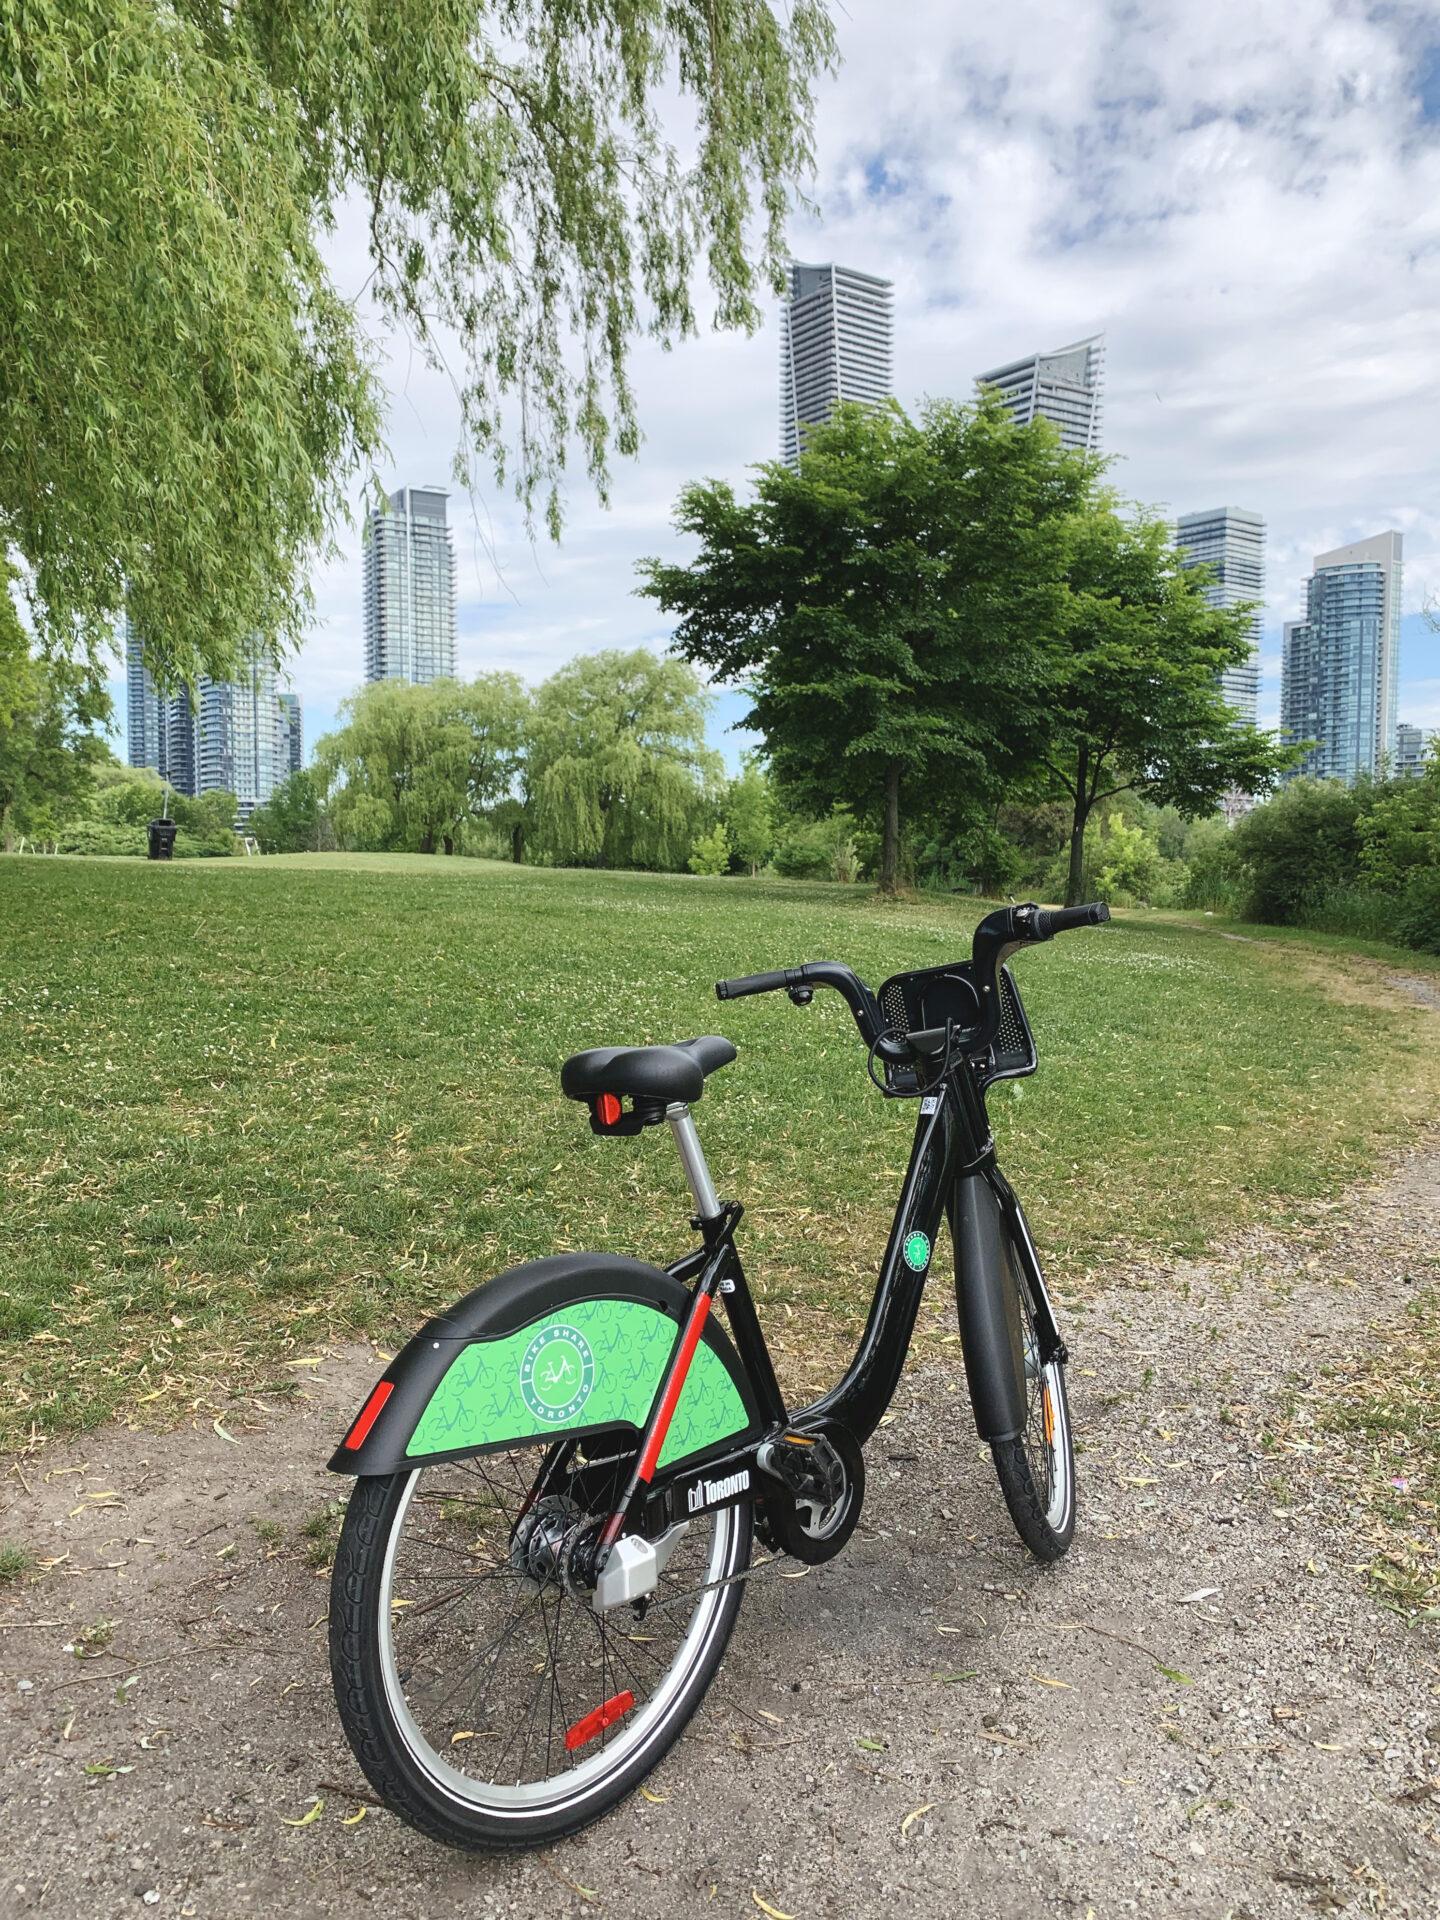 Bike Share rental at Humber Bay Park, Toronto